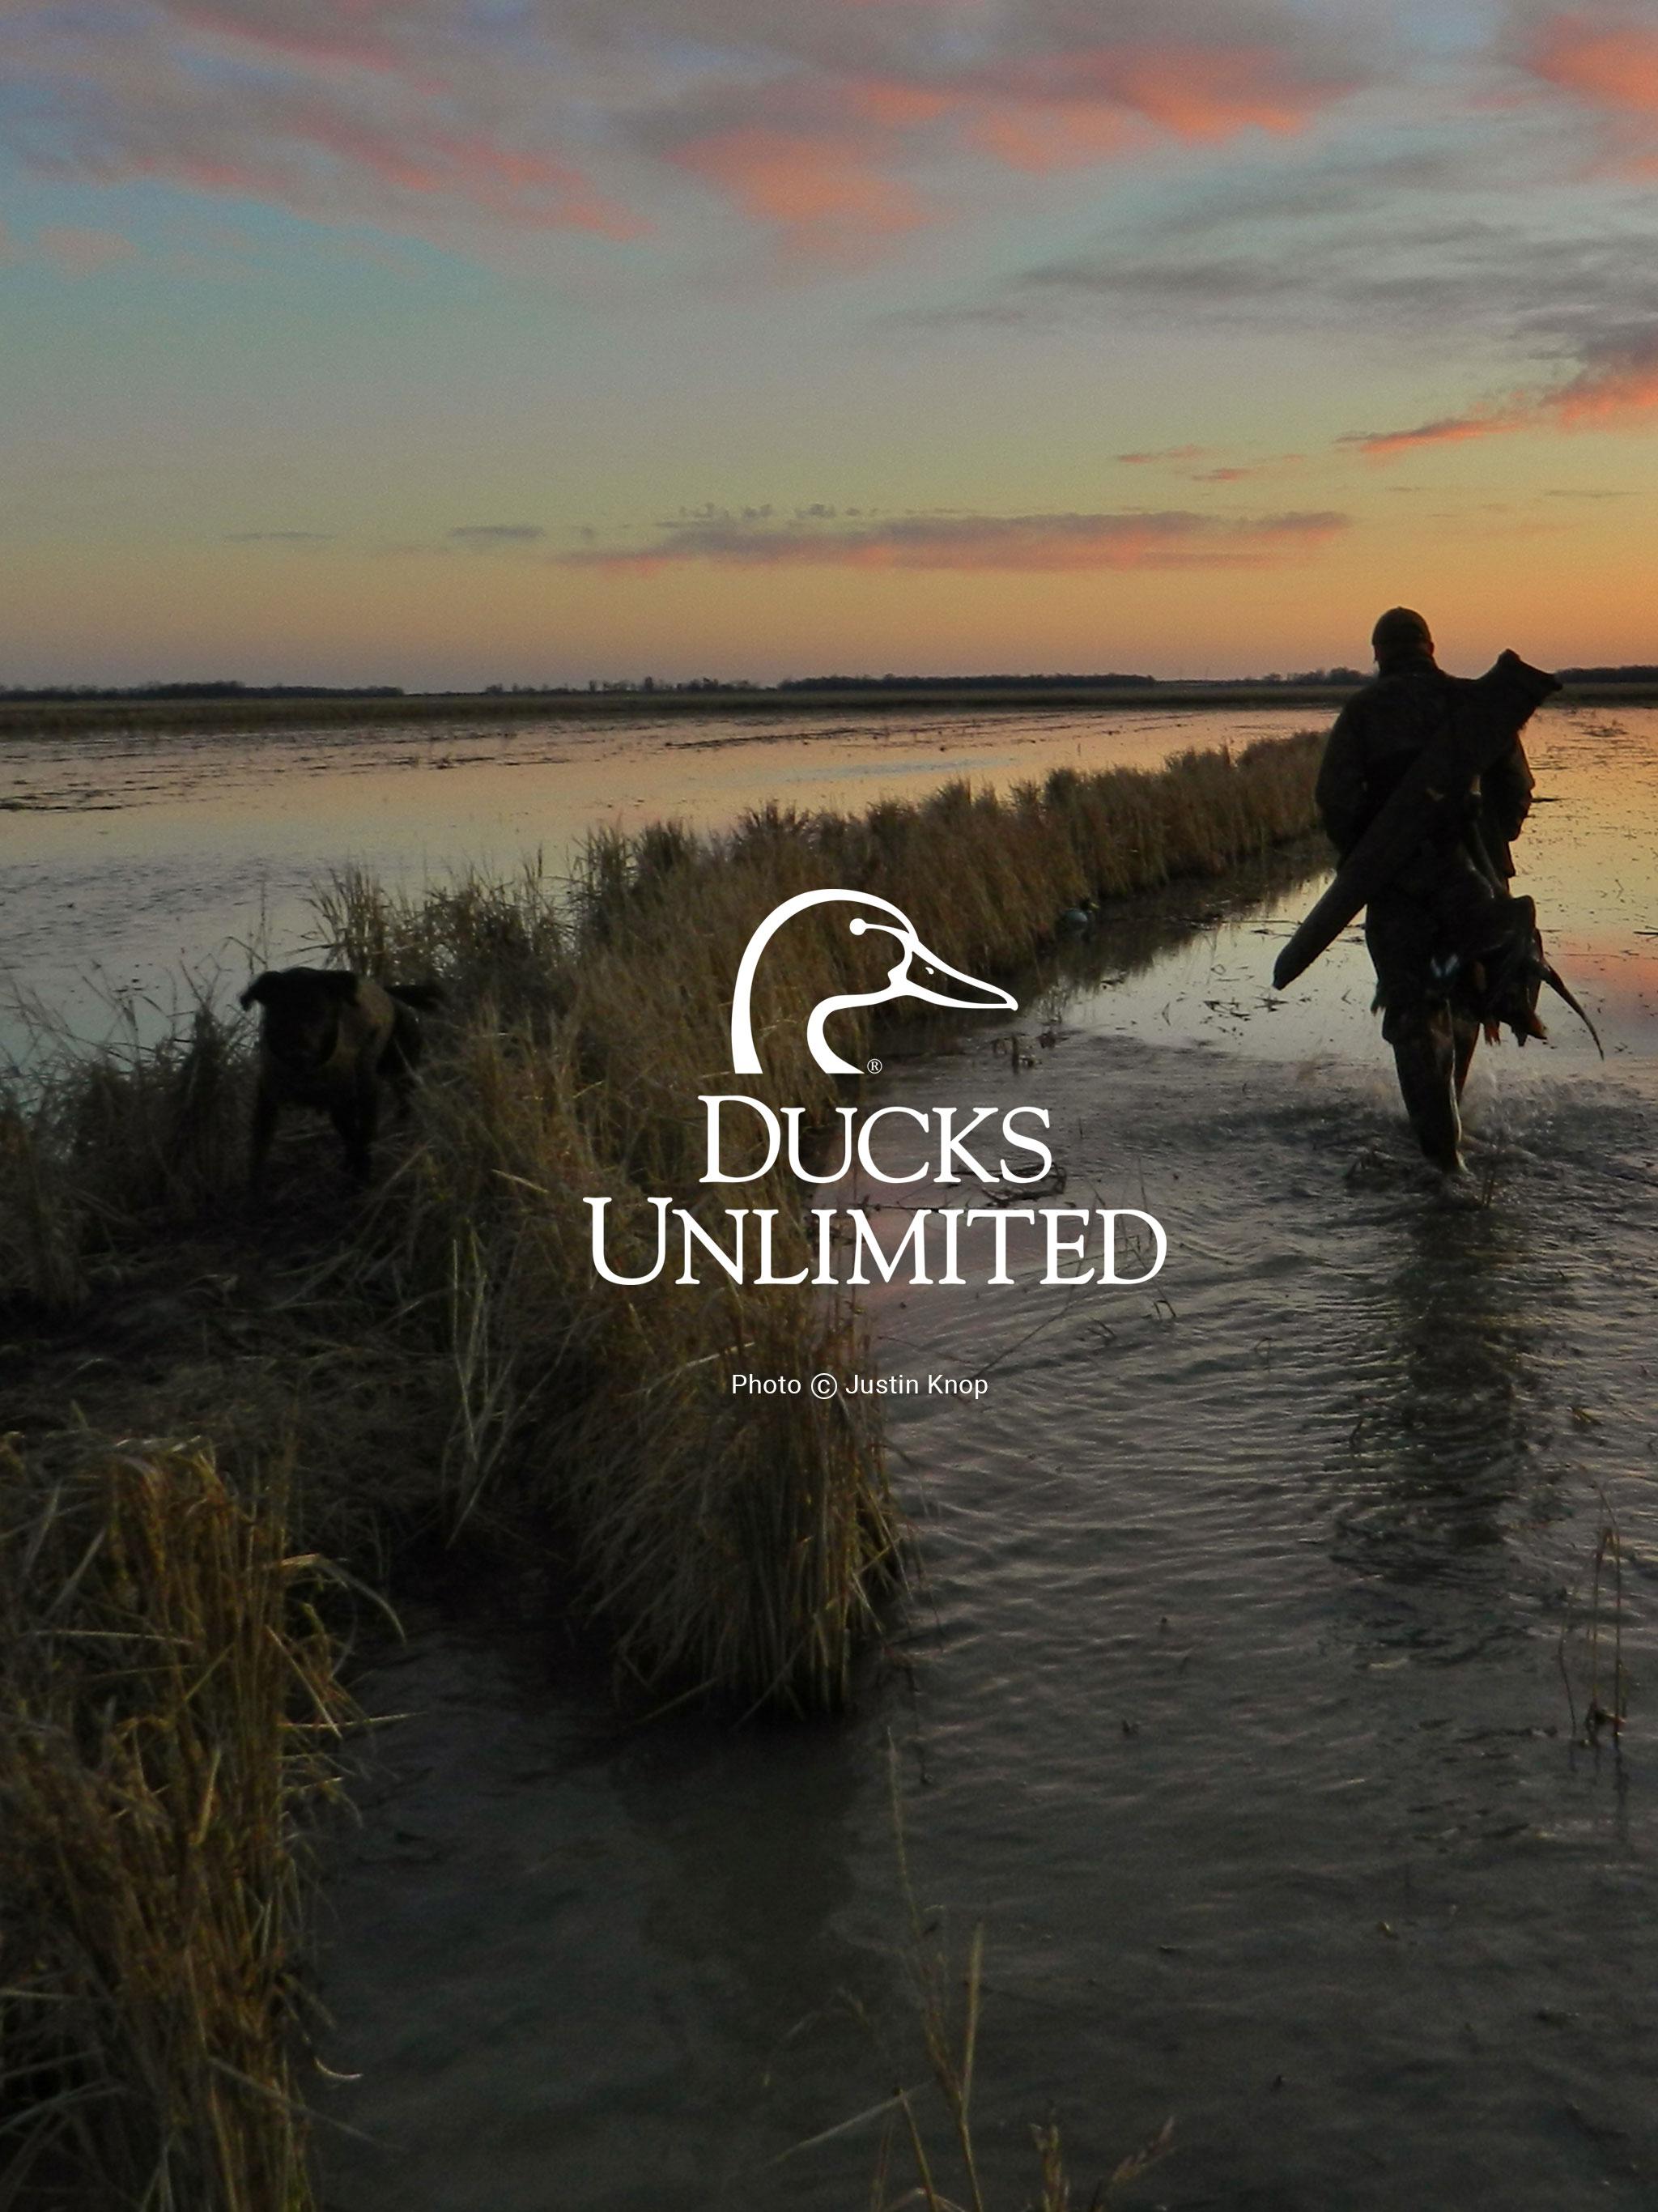 North Carolina Wallpaper Iphone Ducks Unlimited Mobile Wallpaper